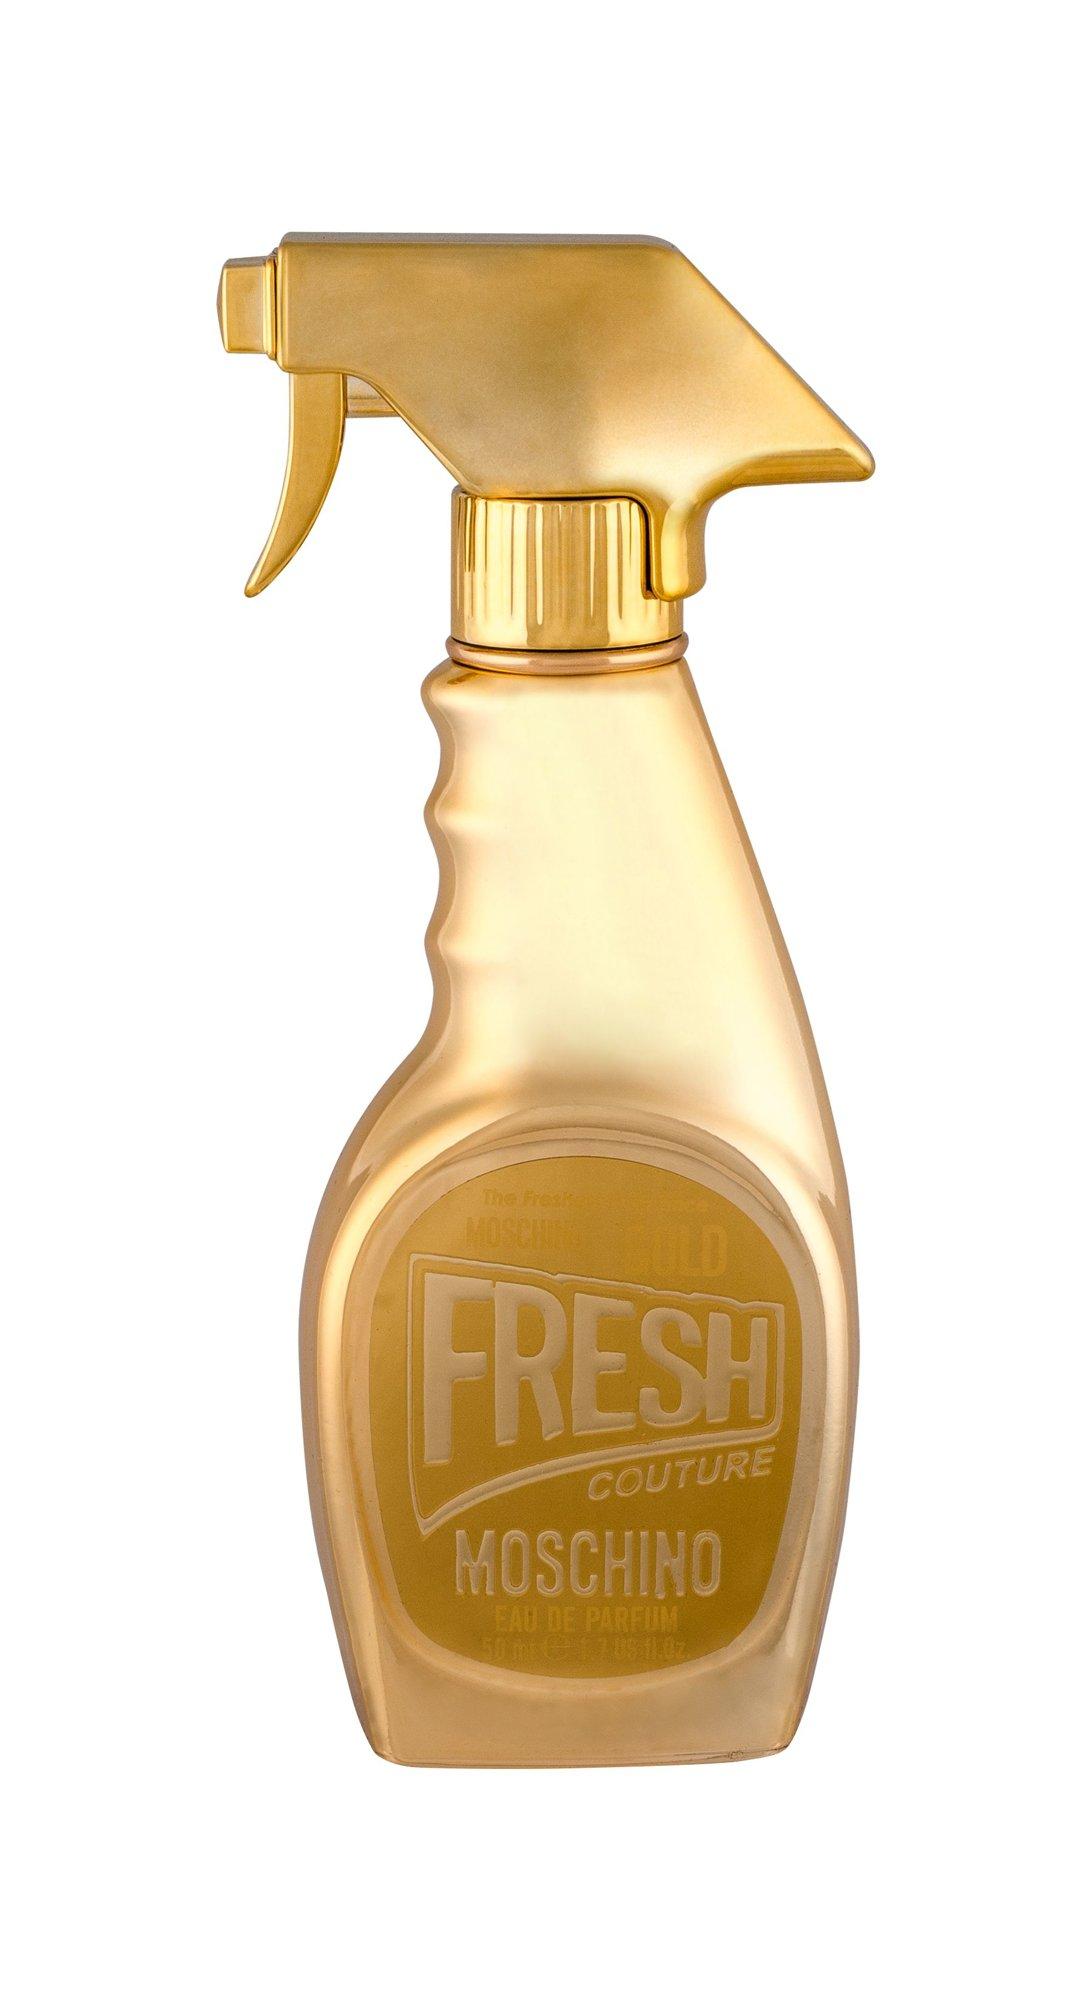 Moschino Fresh Couture Eau de Parfum 50ml